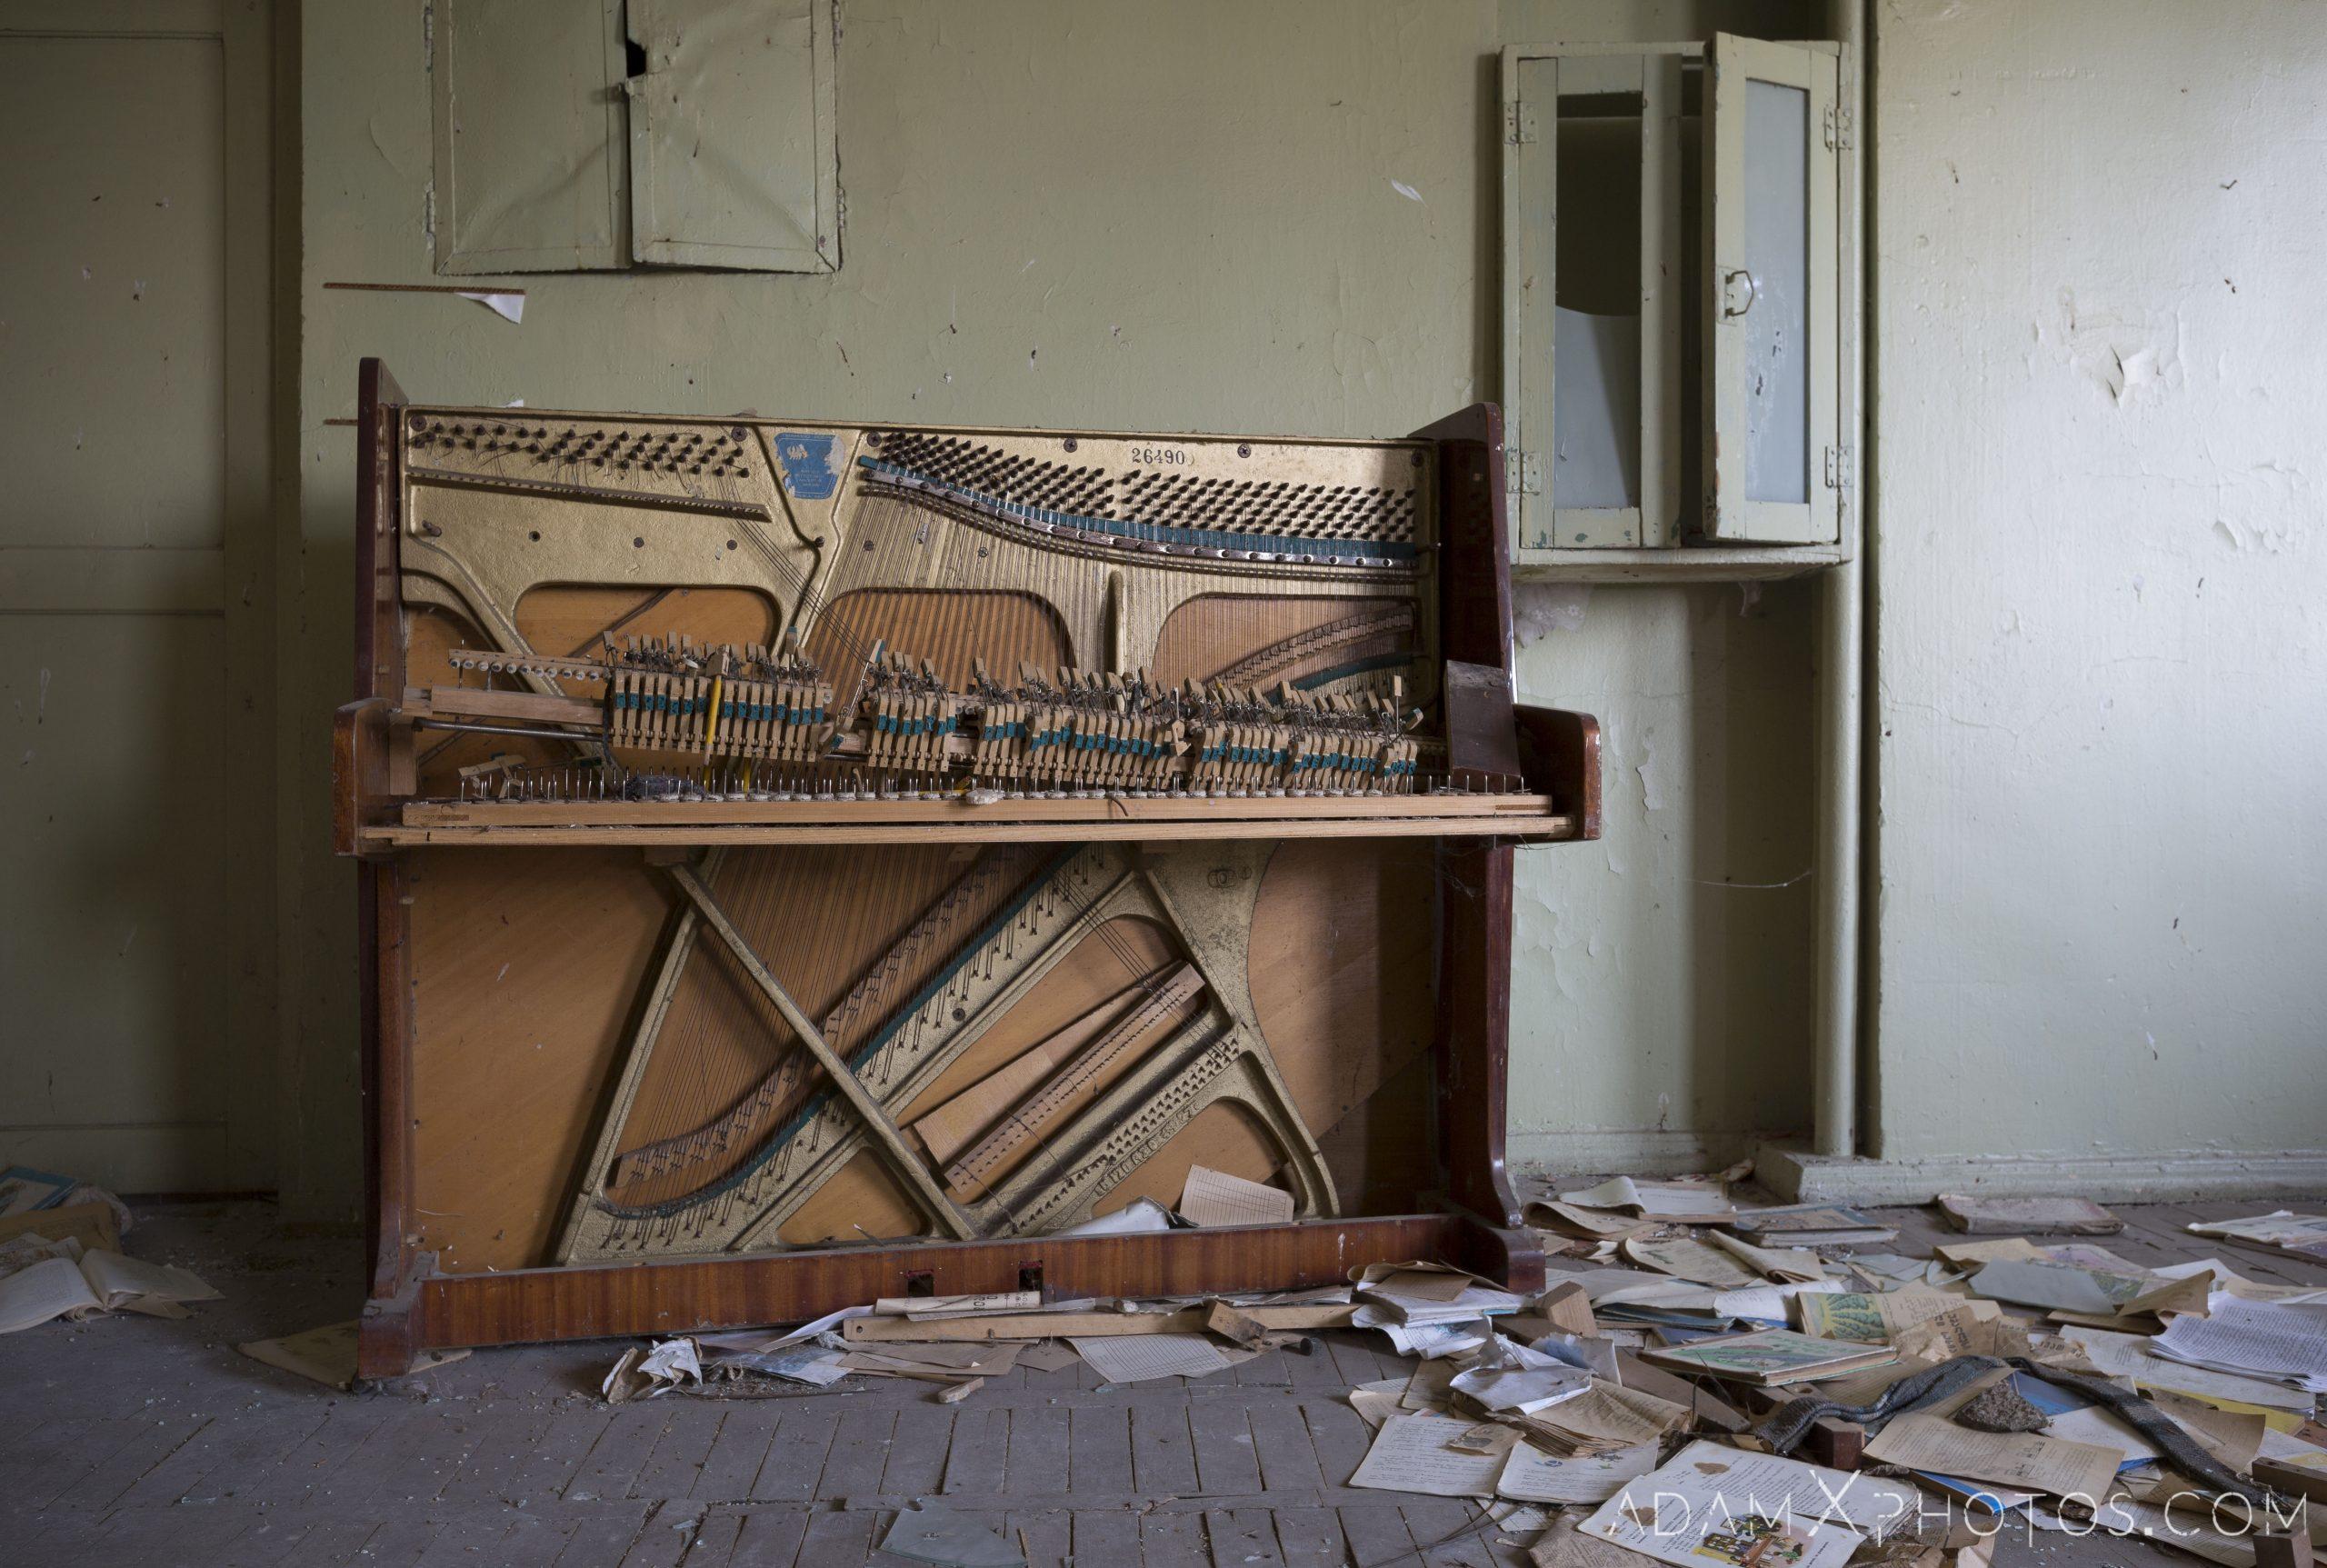 Broken piano classroom Abandoned School rural Soviet era Georgia Adam X AdamXPhotos Urbex Urban Exploration 2018 2019 Abandoned Access History decay ruins lost forgotten derelict location creepy haunting eerie security